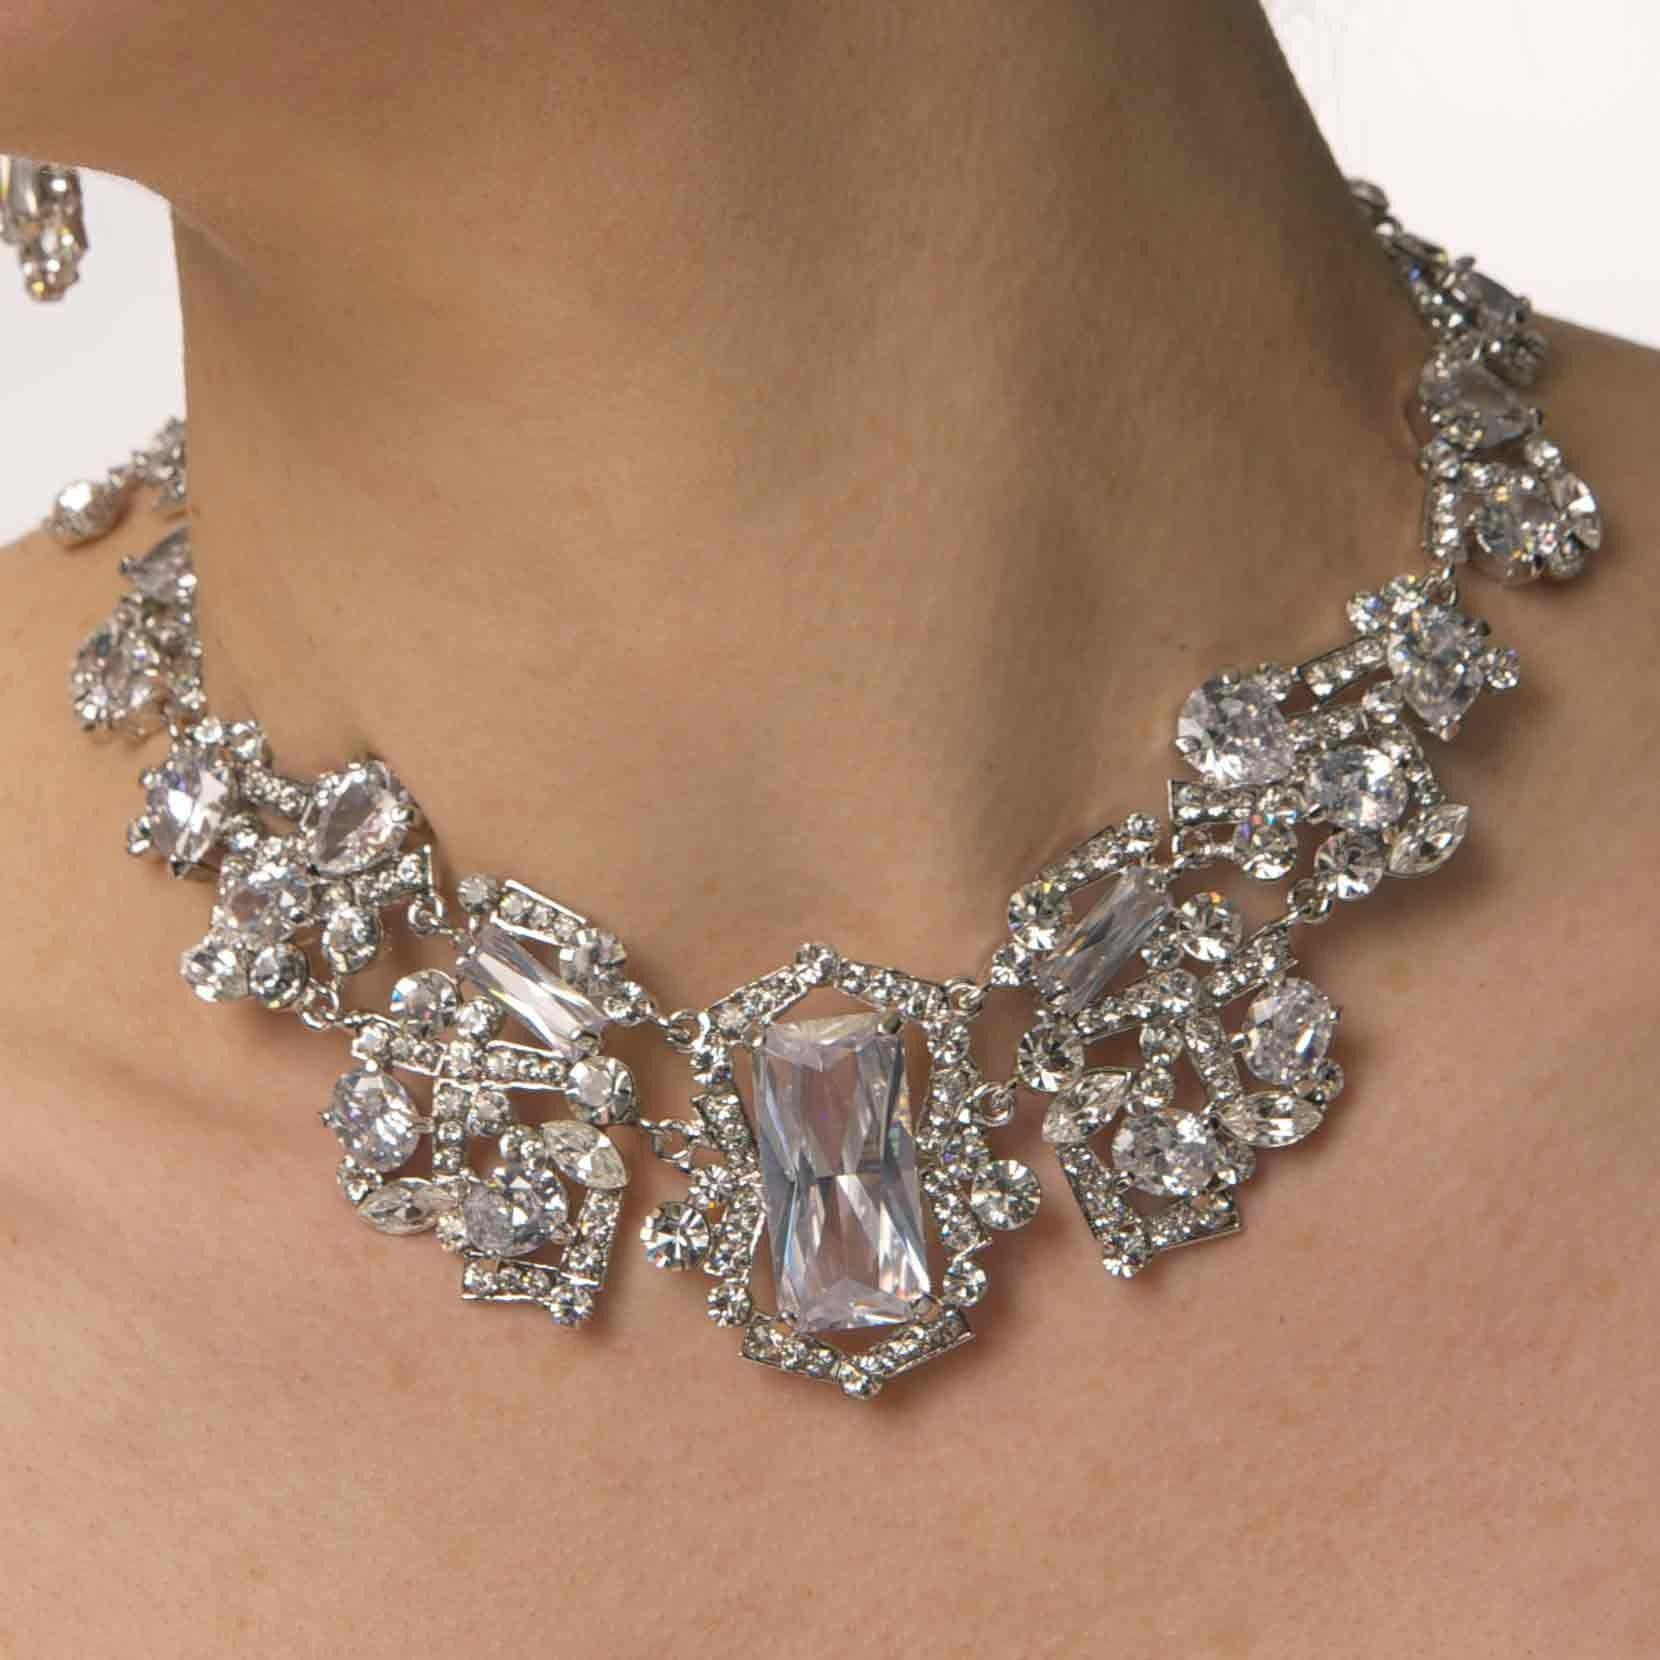 Swarovski crystal jewelry quick overview swarovski crystal swarovski crystal jewelry quick overview swarovski crystal necklace and drop earring set nickel aloadofball Choice Image